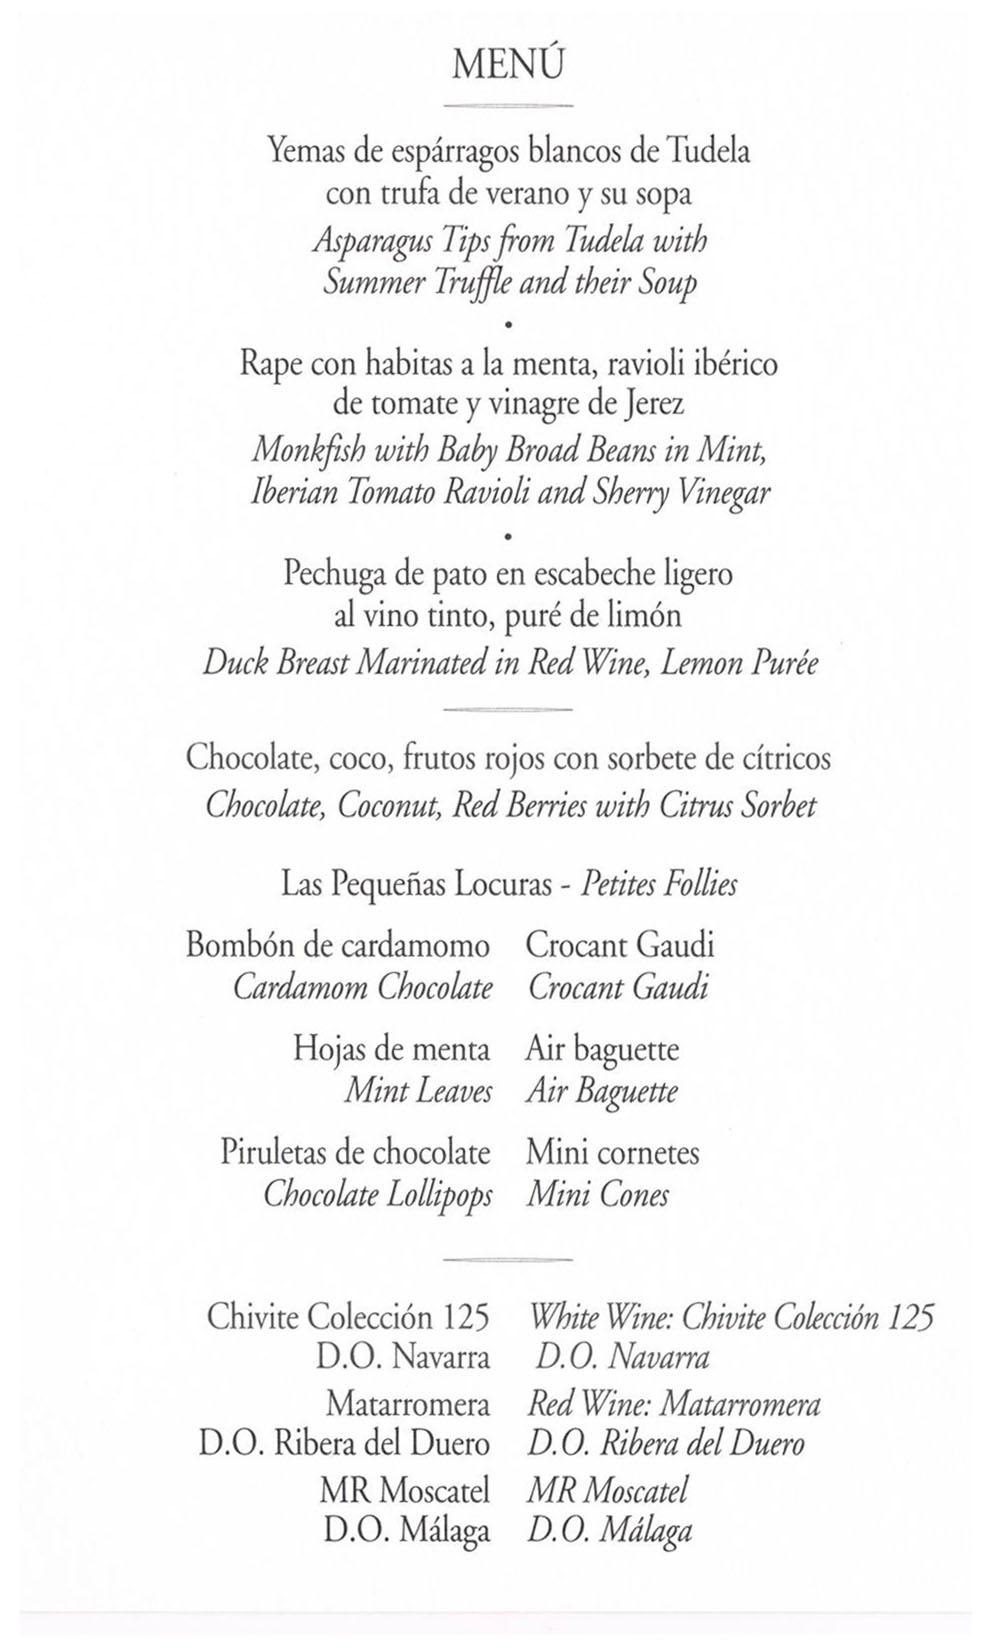 Menú con historia: la cena de la boda de Letizia y Felipe (2004 ...